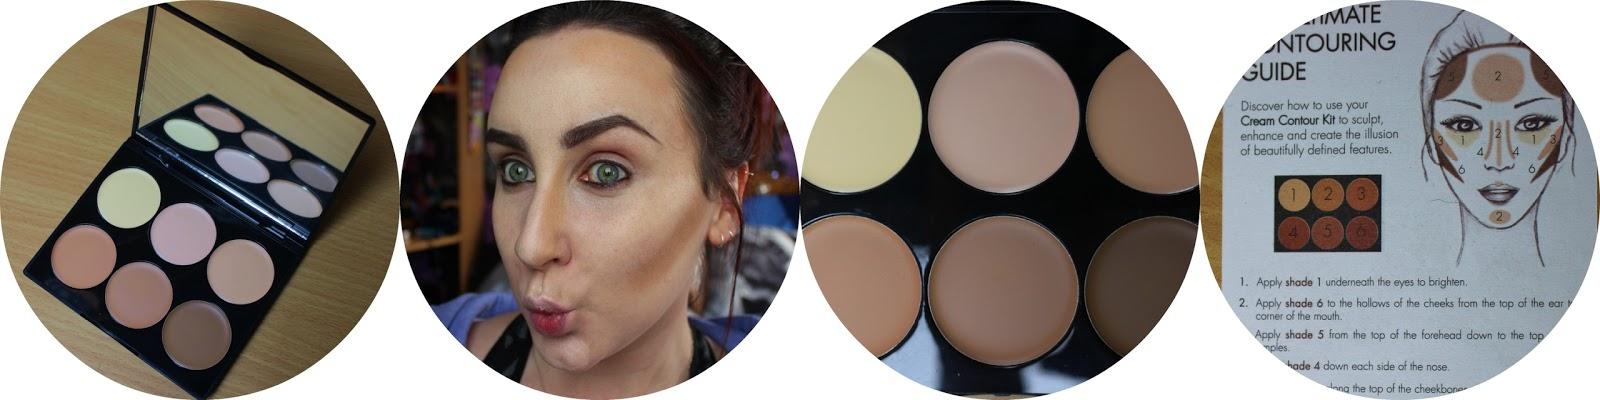 How to contour with the Sleek Cream Contour Kit